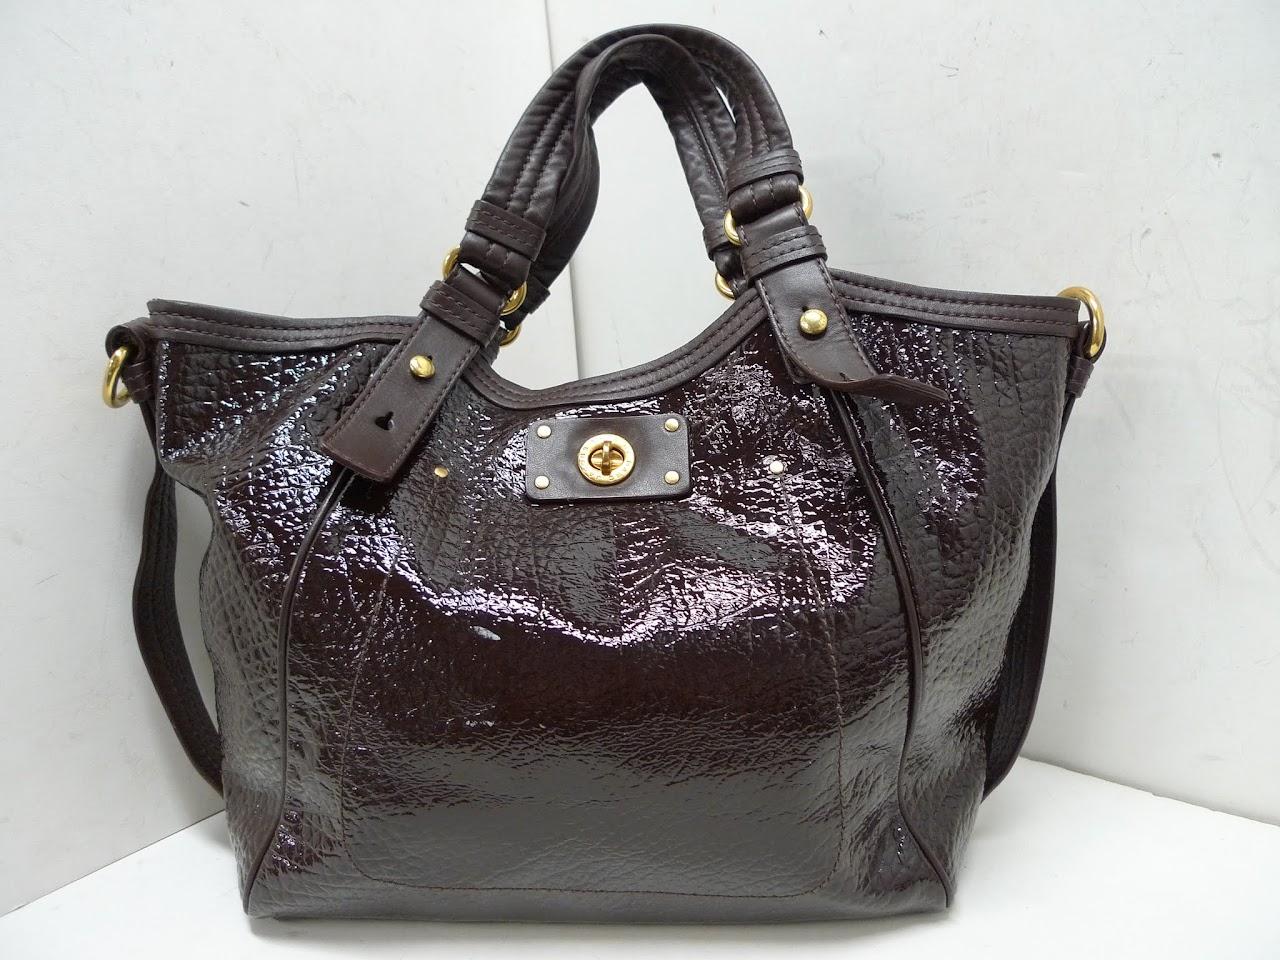 Marc by Marc Jacobs Dark Brown Shoulder Bag